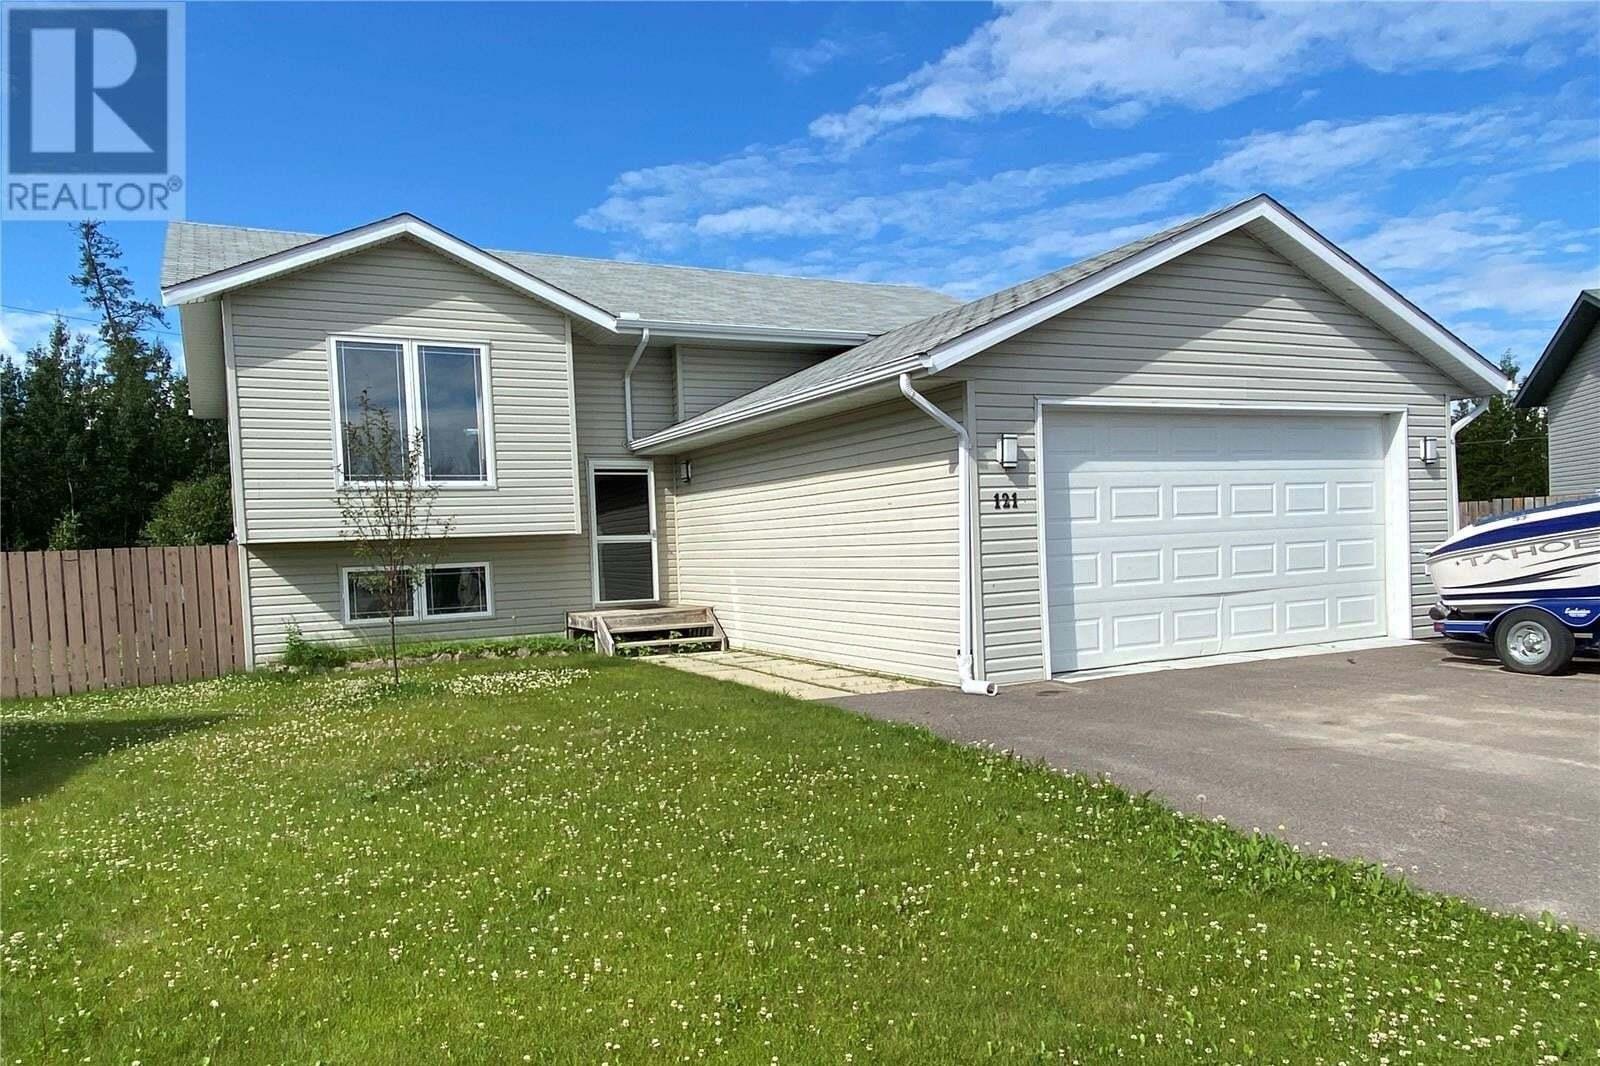 House for sale at 121 Glass Pl La Ronge Saskatchewan - MLS: SK817312